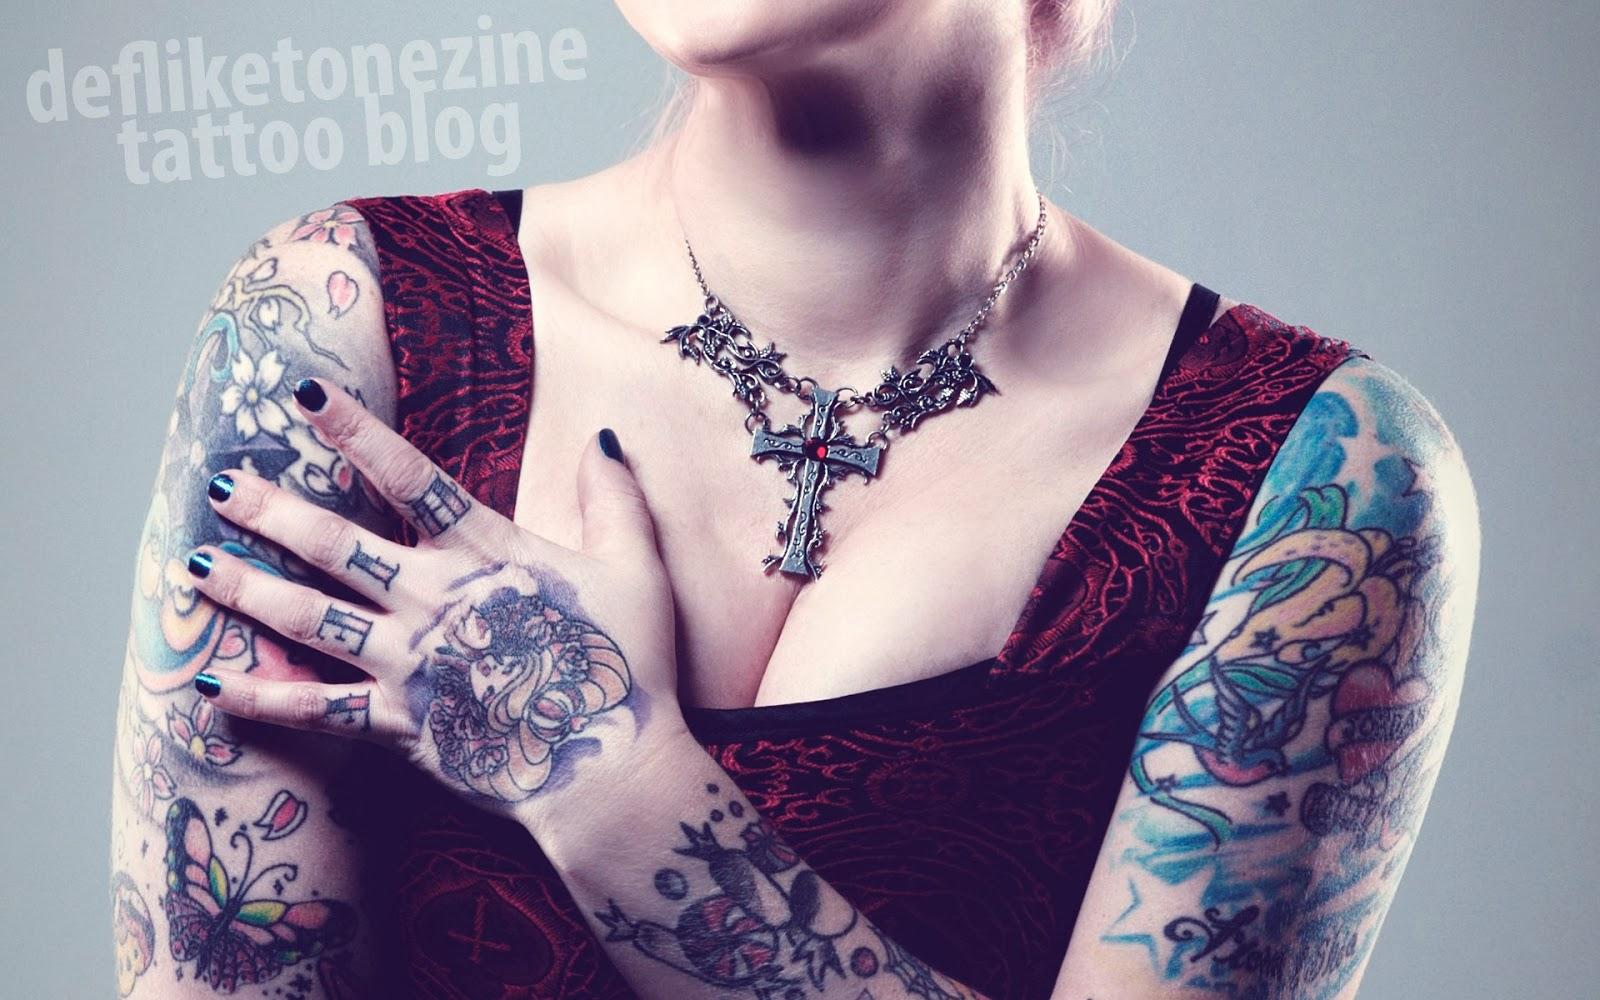 Татуировки для лесби фото 9 фотография